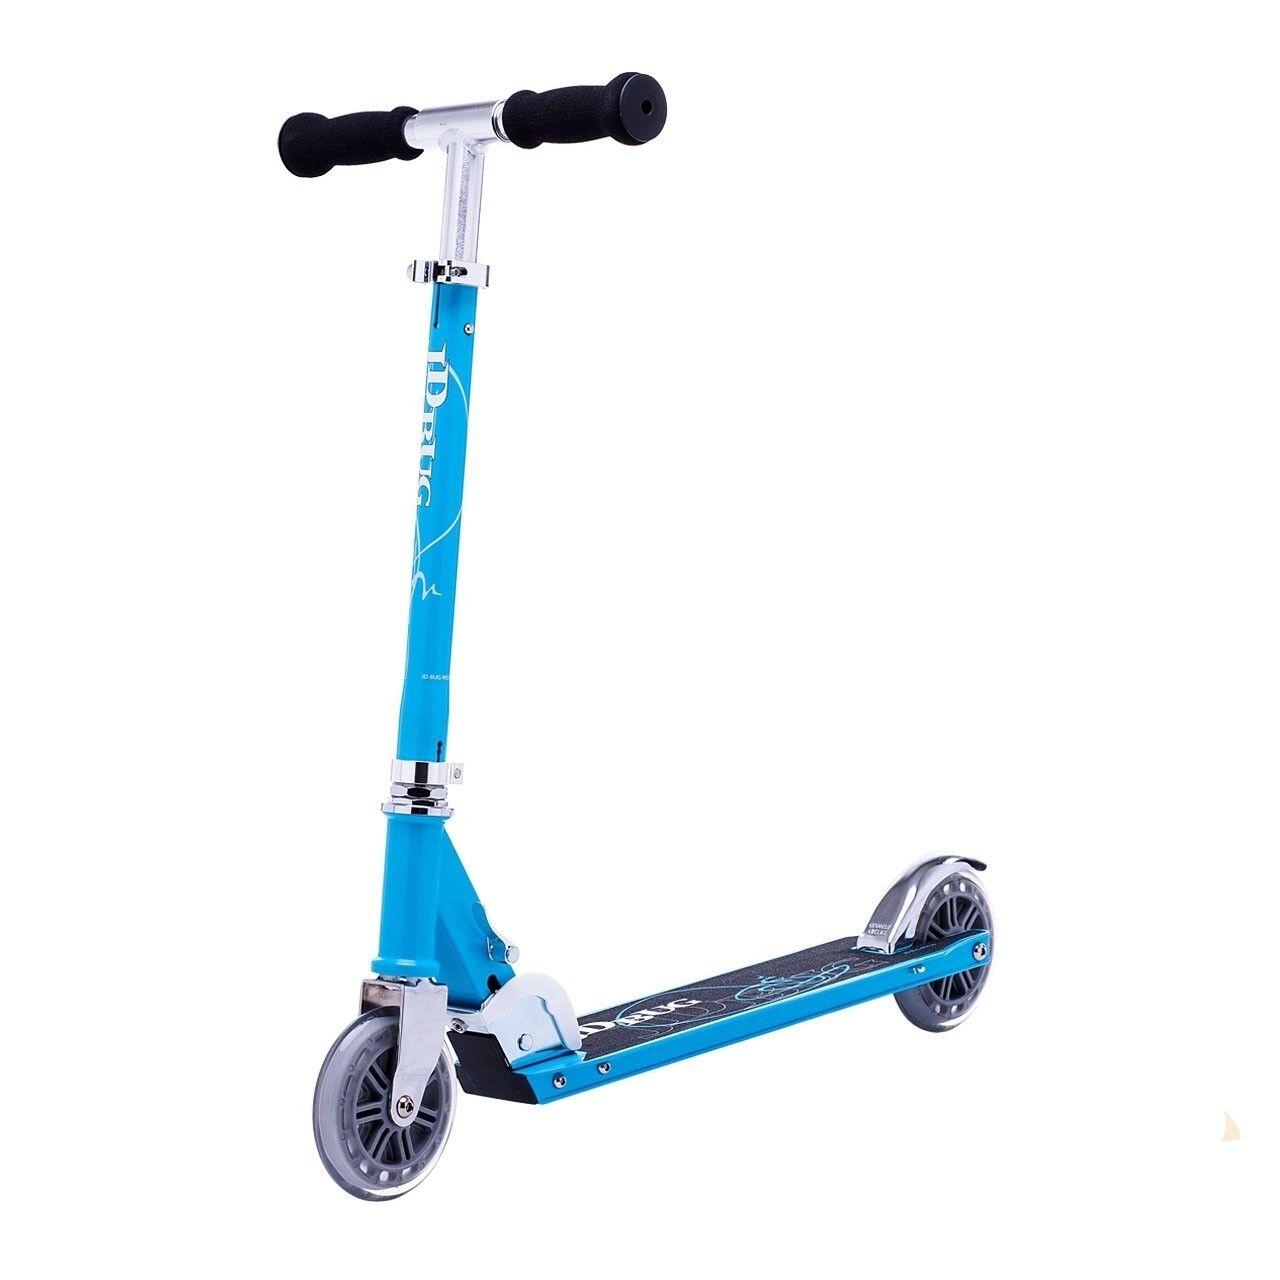 Jd Bug Original Street 120 Séries Réglable Pliable Scooter - Blau Ciel